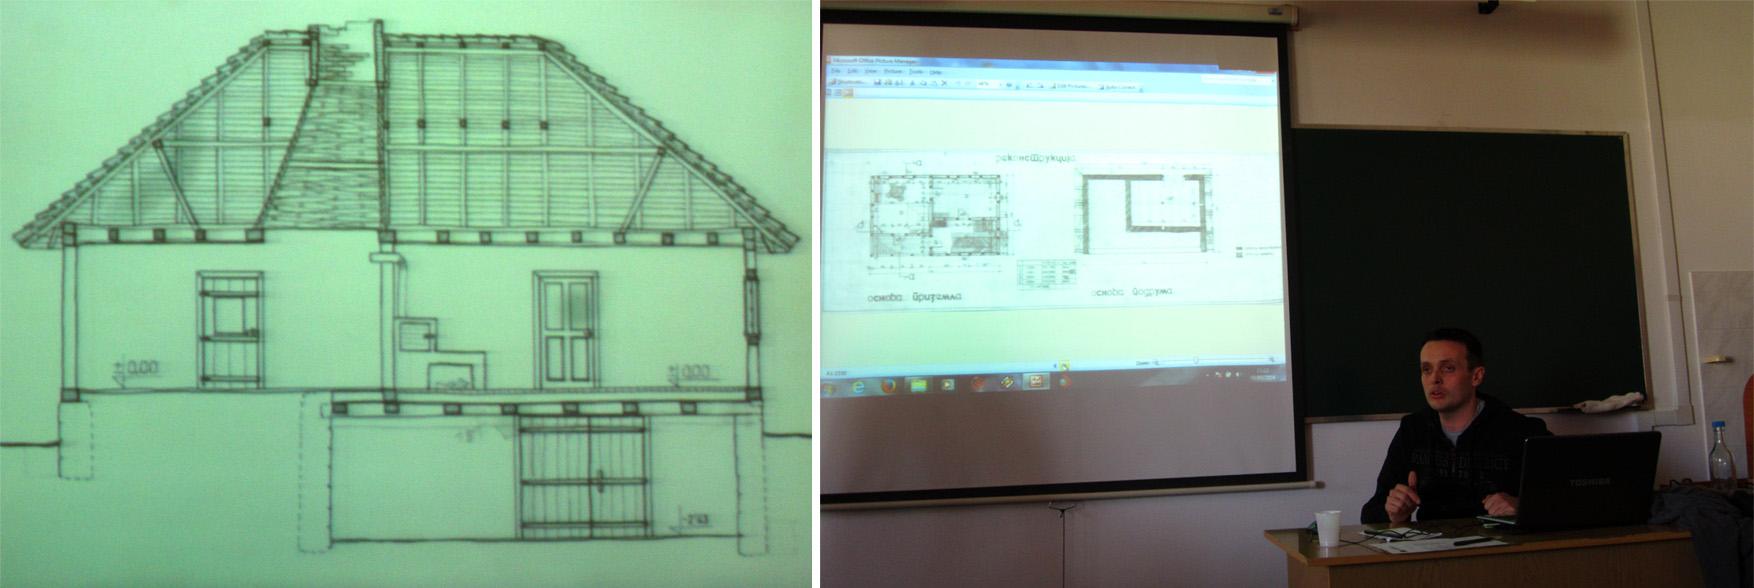 09 ubrzani kurs zemljane arhitekture testovi Slobodan Radovanovic KOTO doo